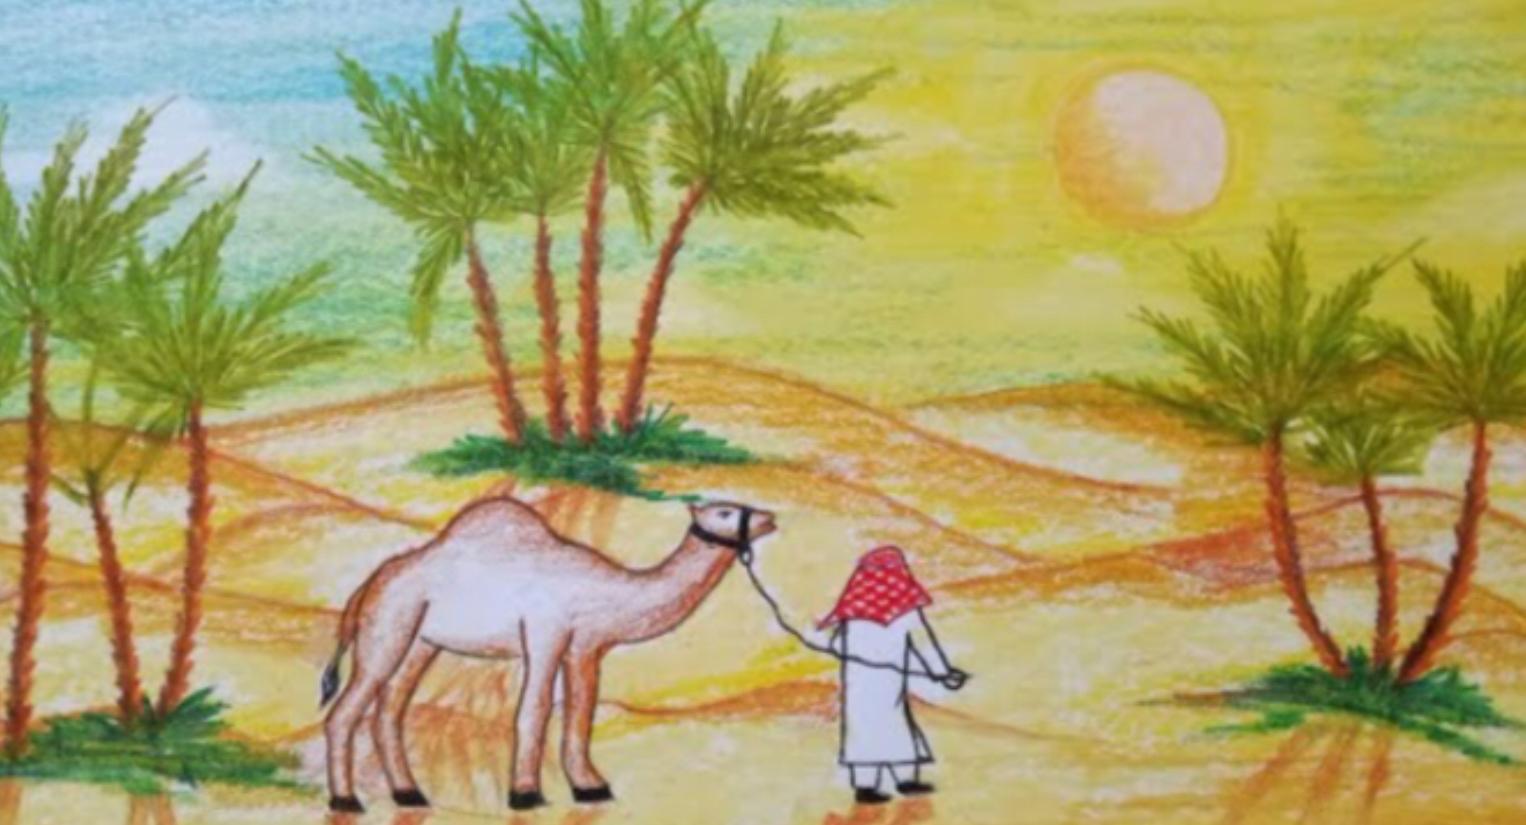 The Arabian Desert by Iffah Ahmed